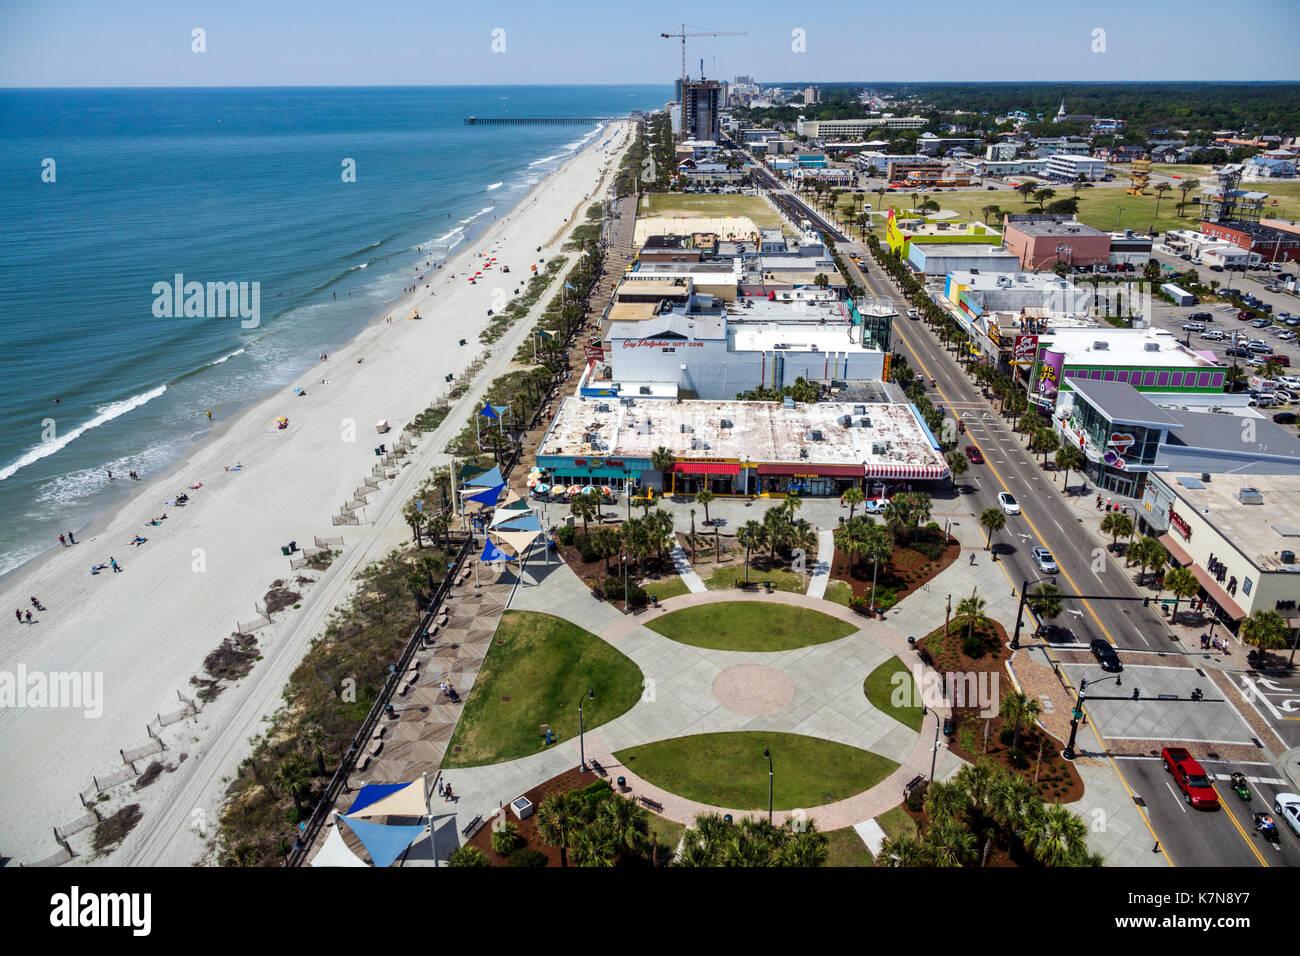 Myrtle Beach South Carolina SC Atlantic Ocean North Ocean Boulevard Plyler Park boardwalk SkyWheel Ferris wheel - Stock Image